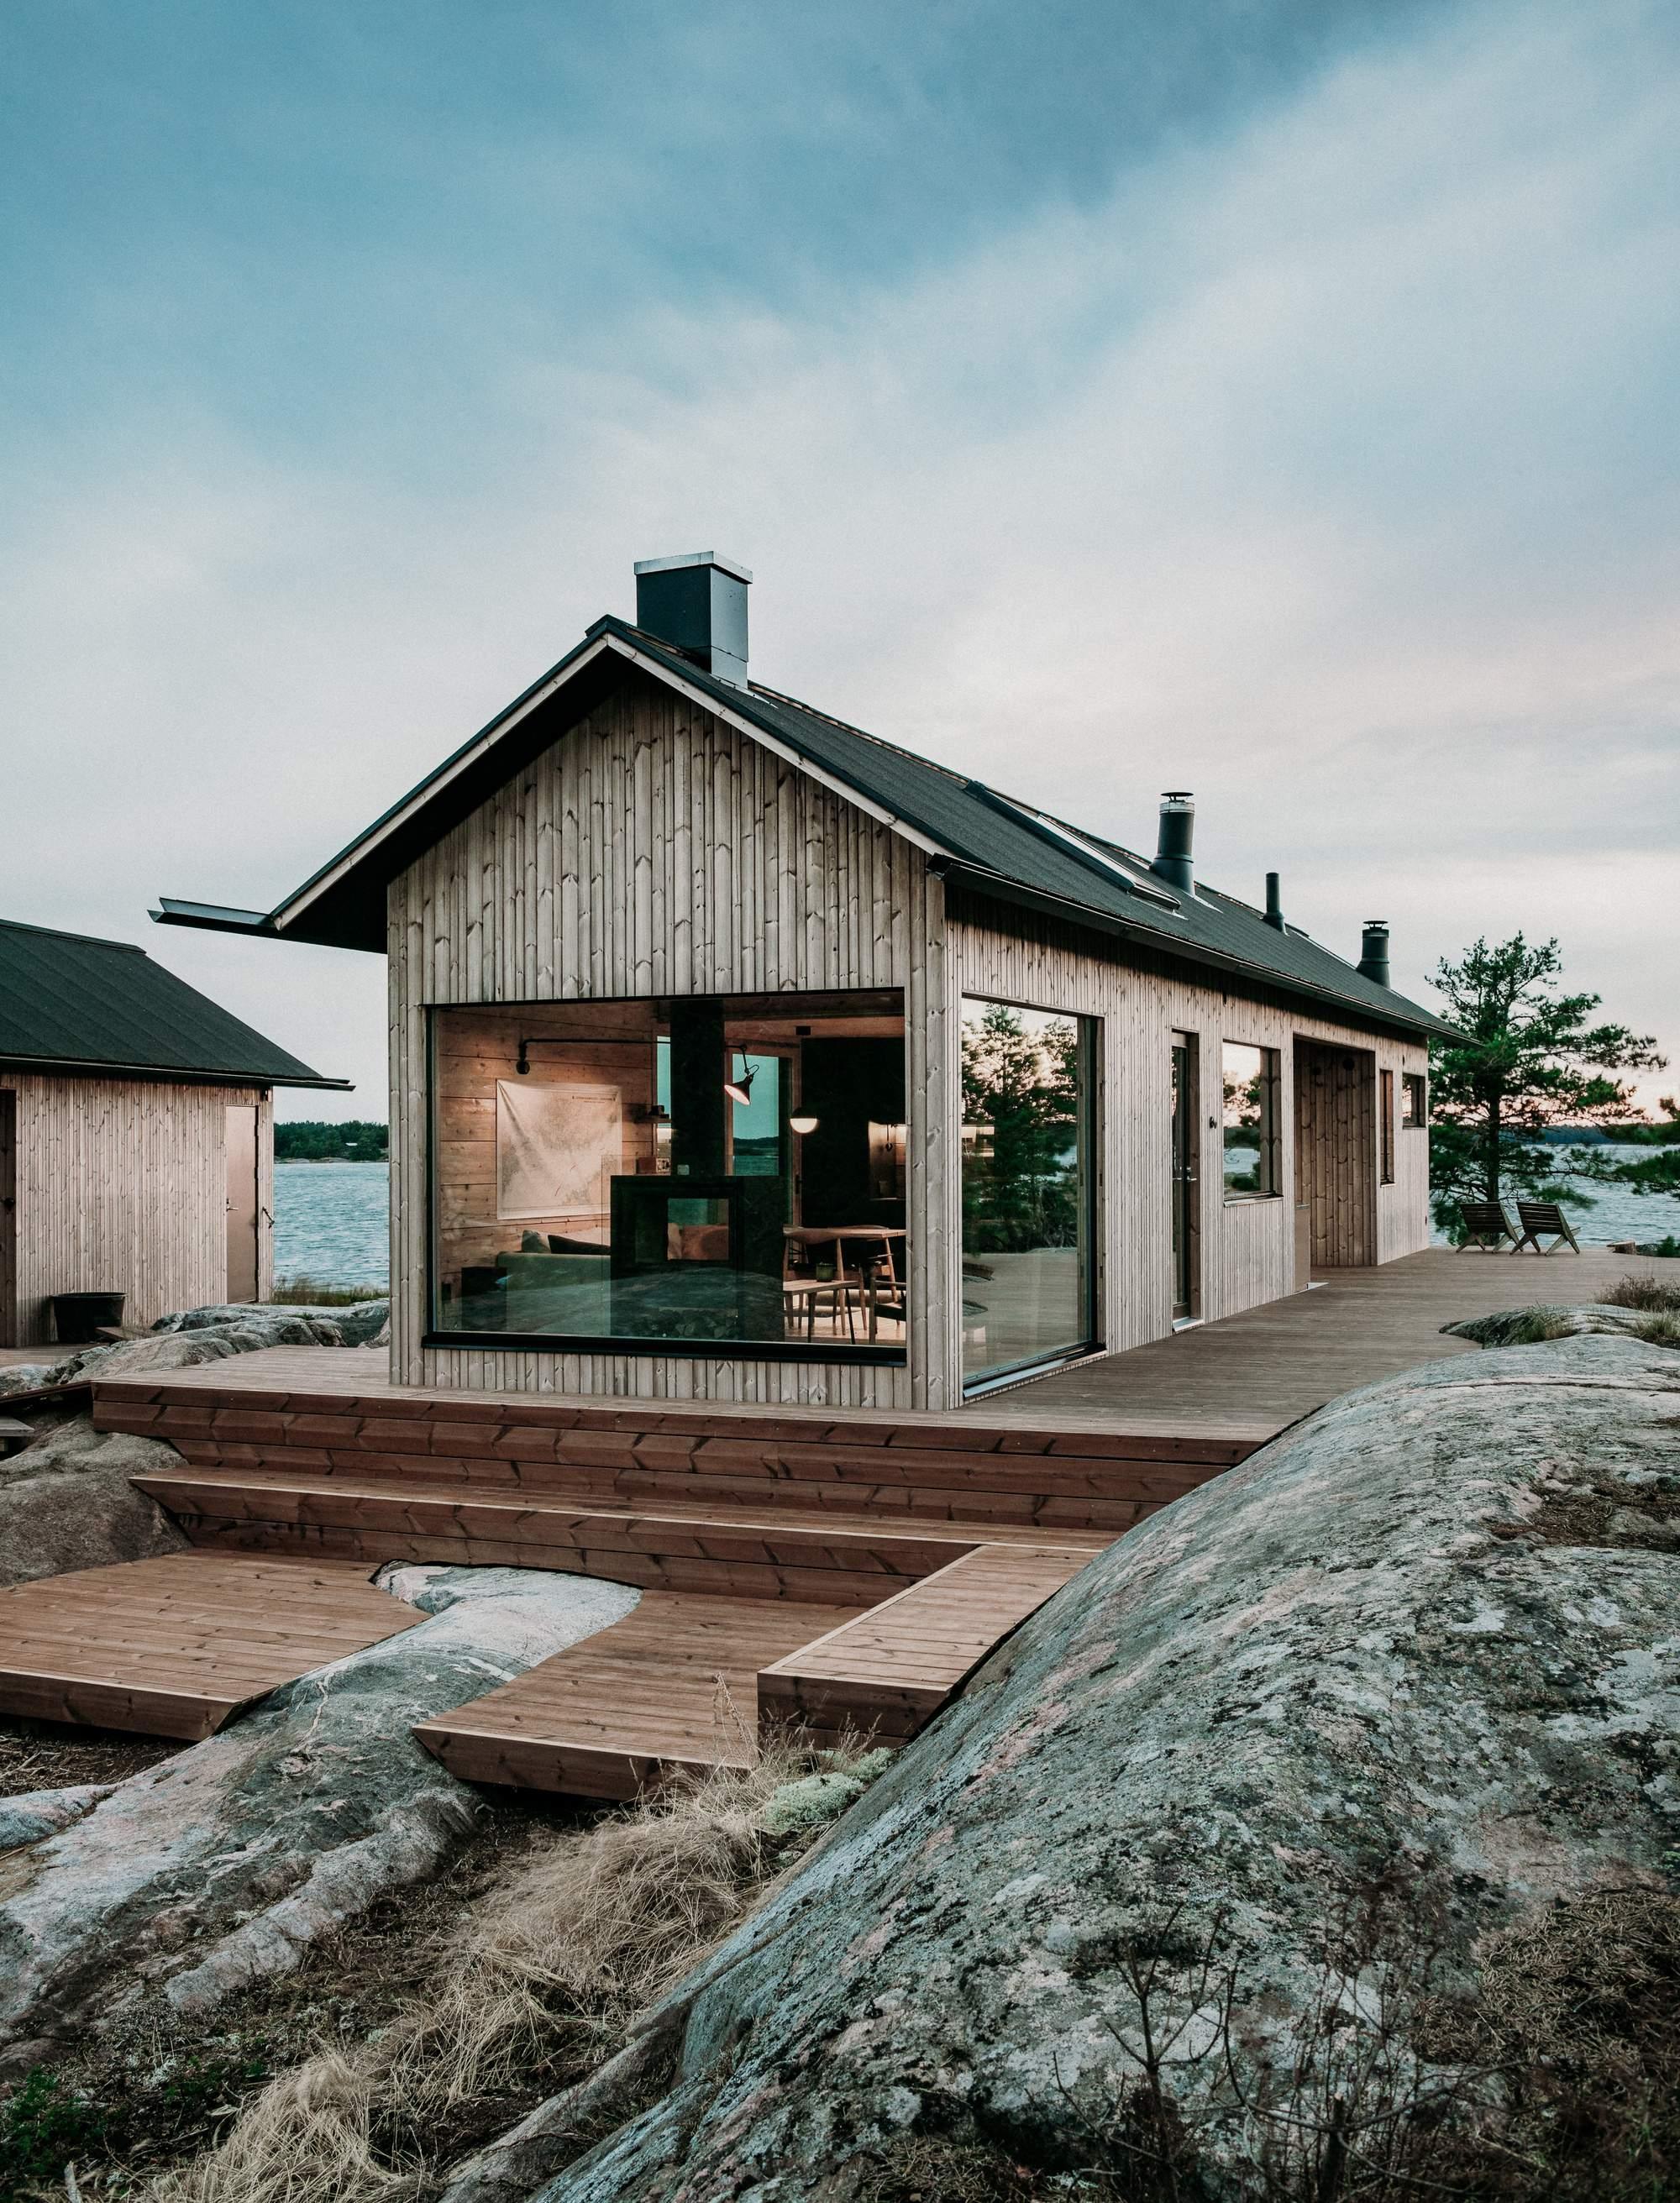 Летний коттедж на архипелаге в Финляндии